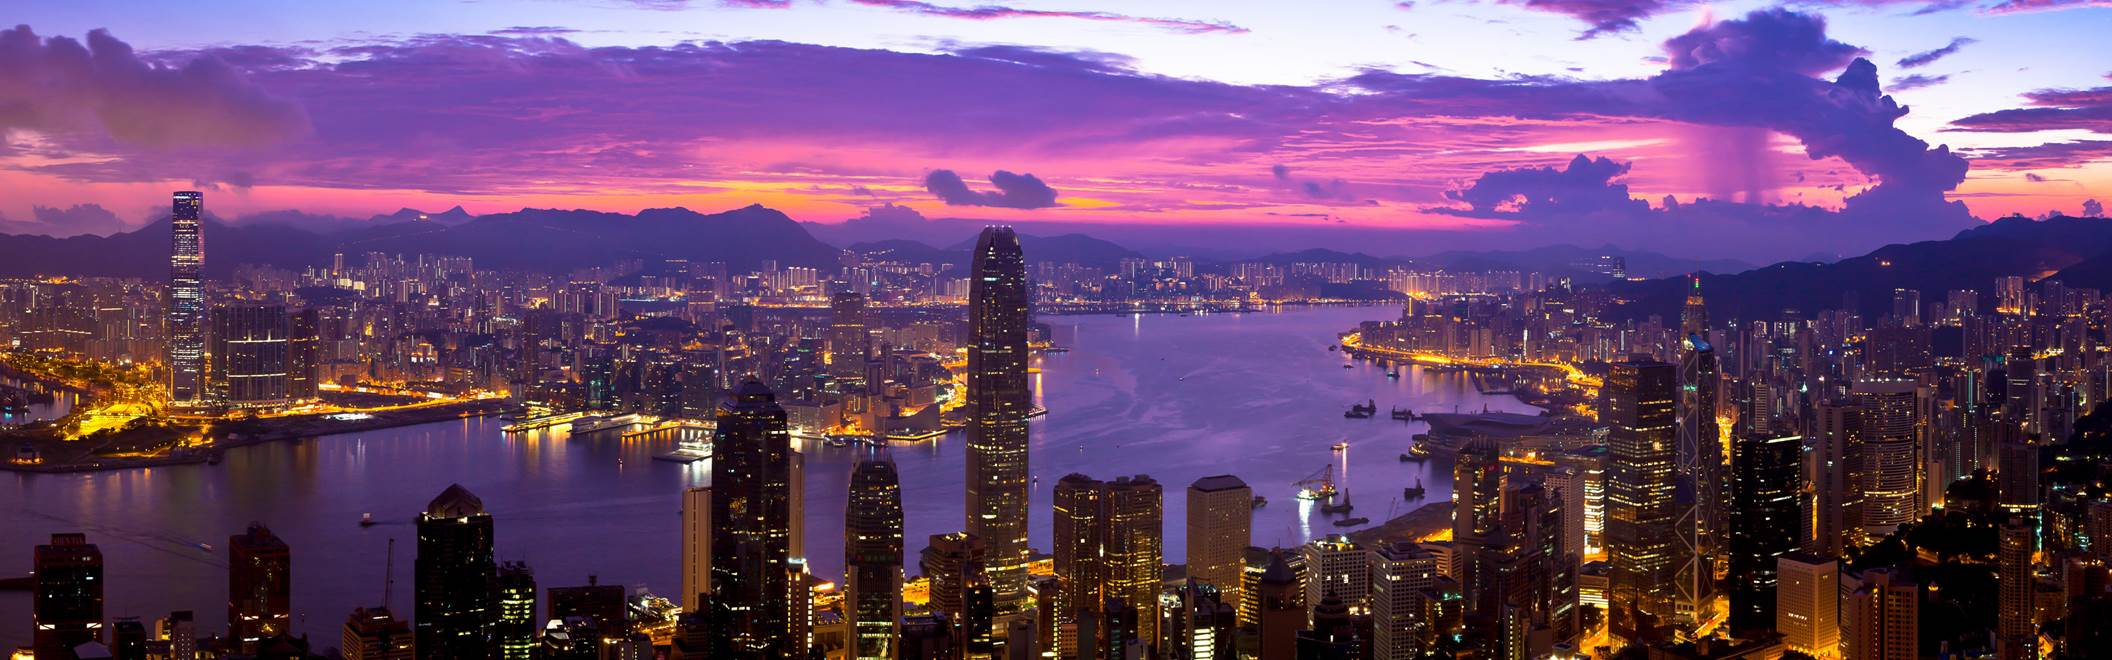 My friend Stuart sent me this brilliant panoramic vista of Hong Kong at sunset, taken from the Peak, thanks Stuart!